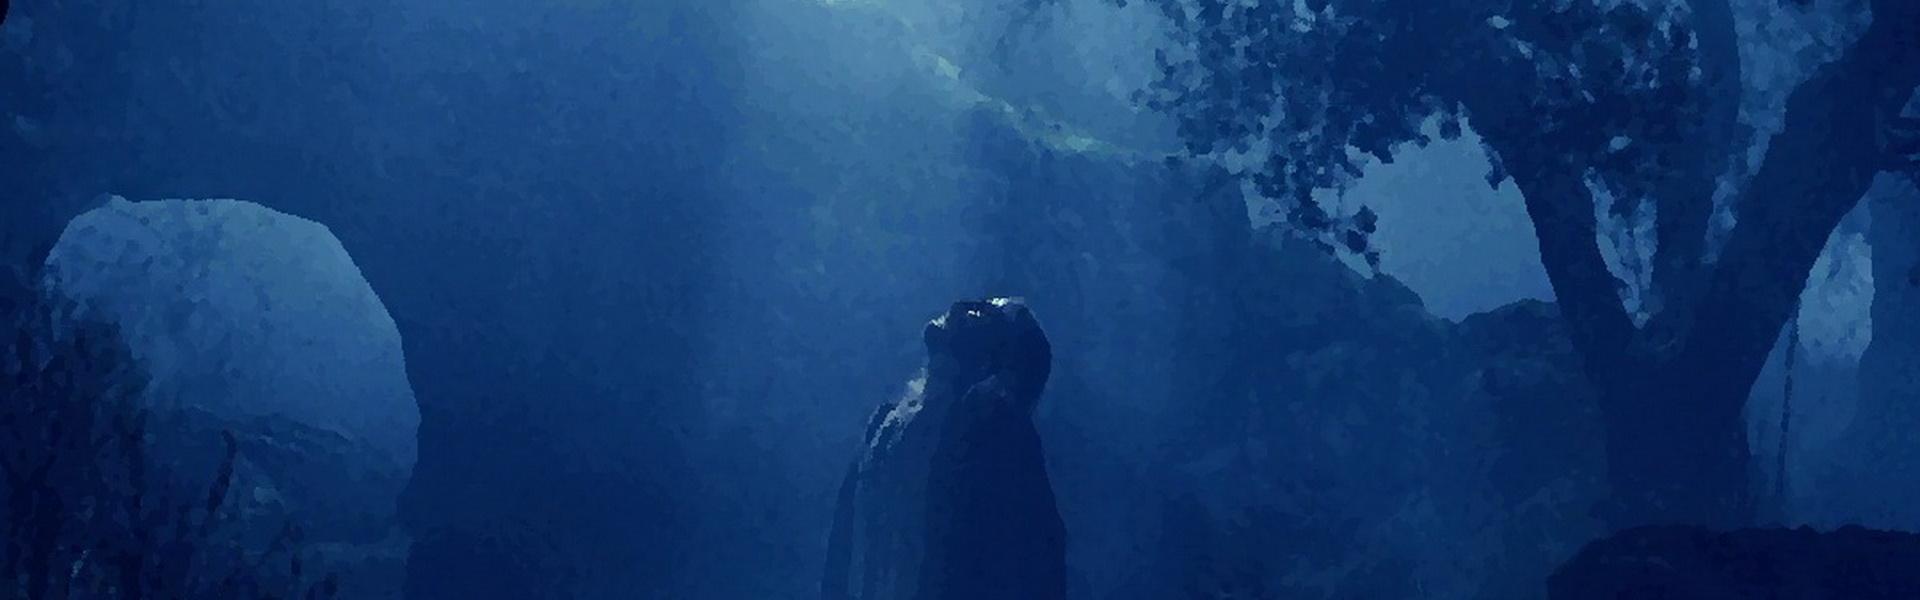 Getsemani 3